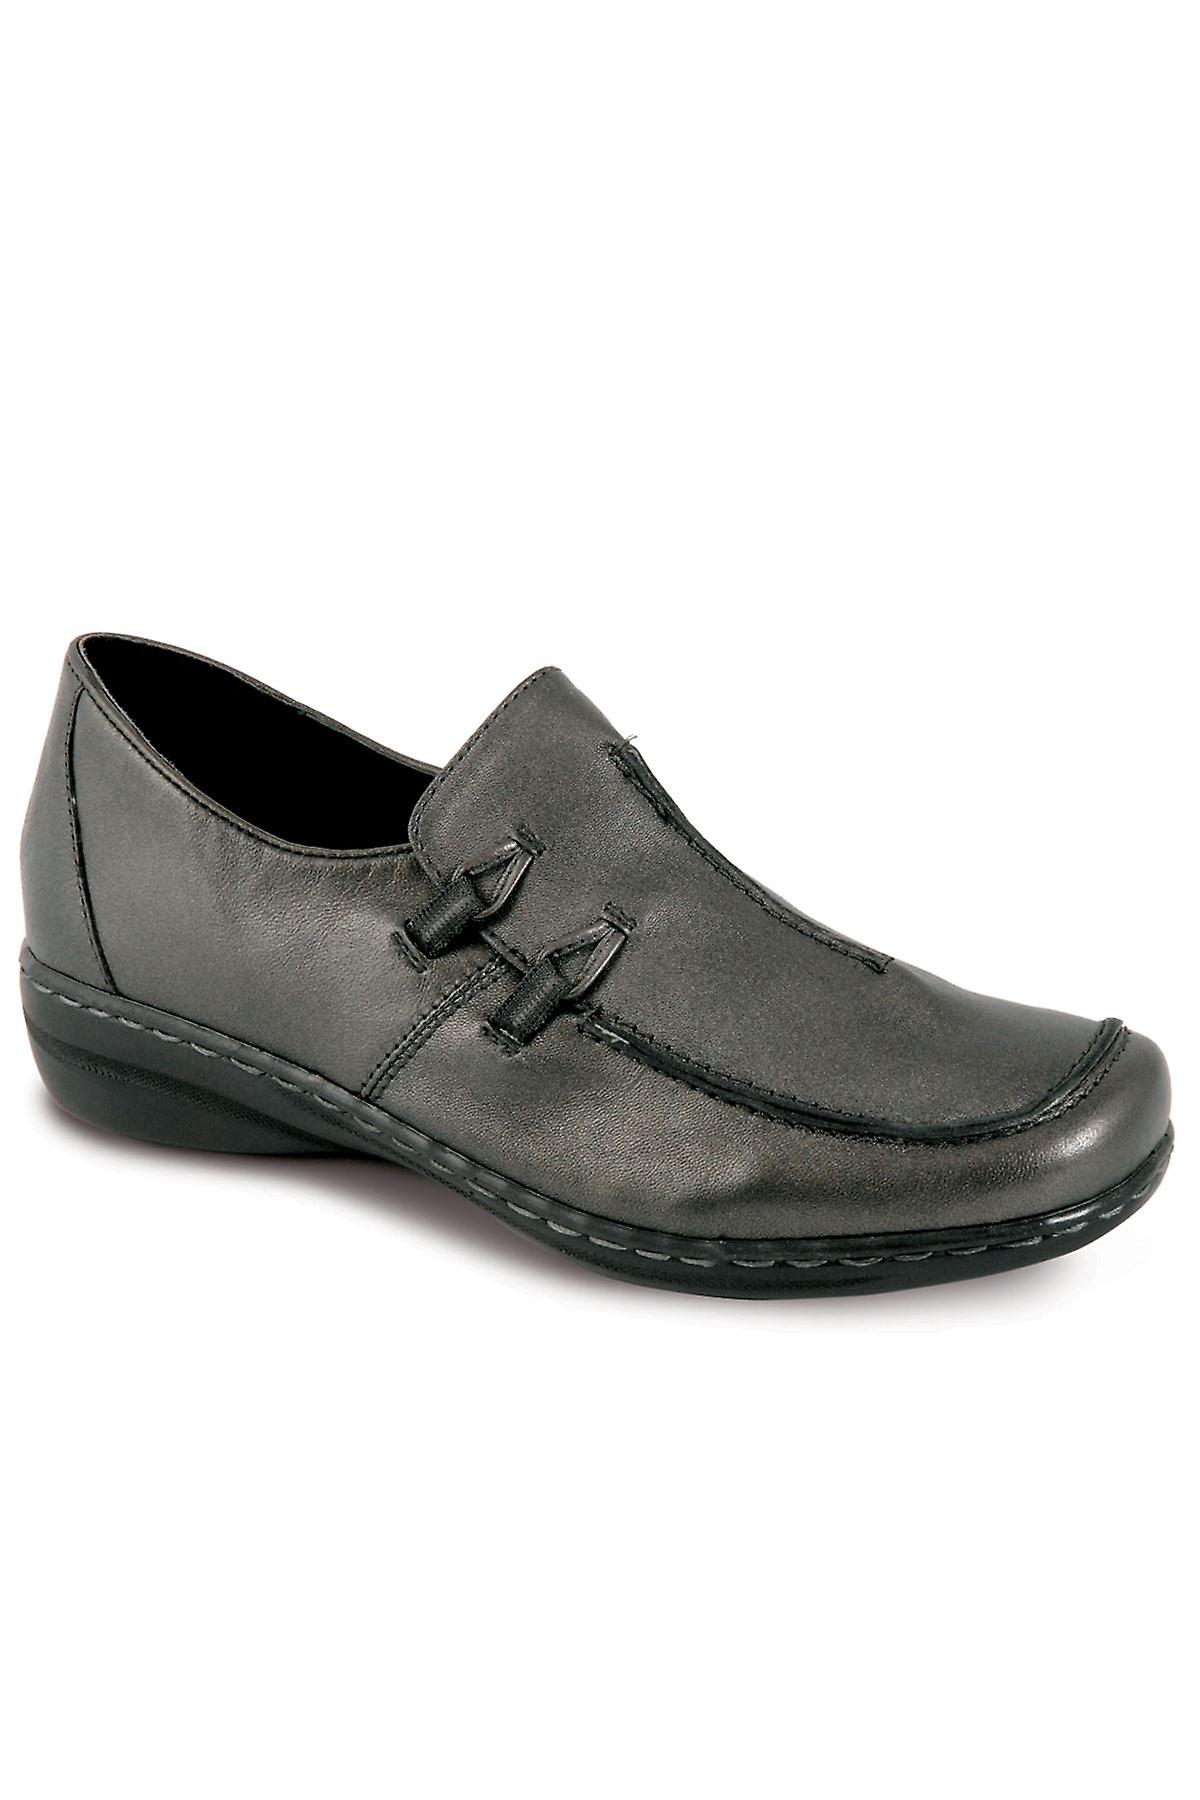 Ladies Slip On Low Heel Comfortable Plain Black Navy Pewter Women's Shoes